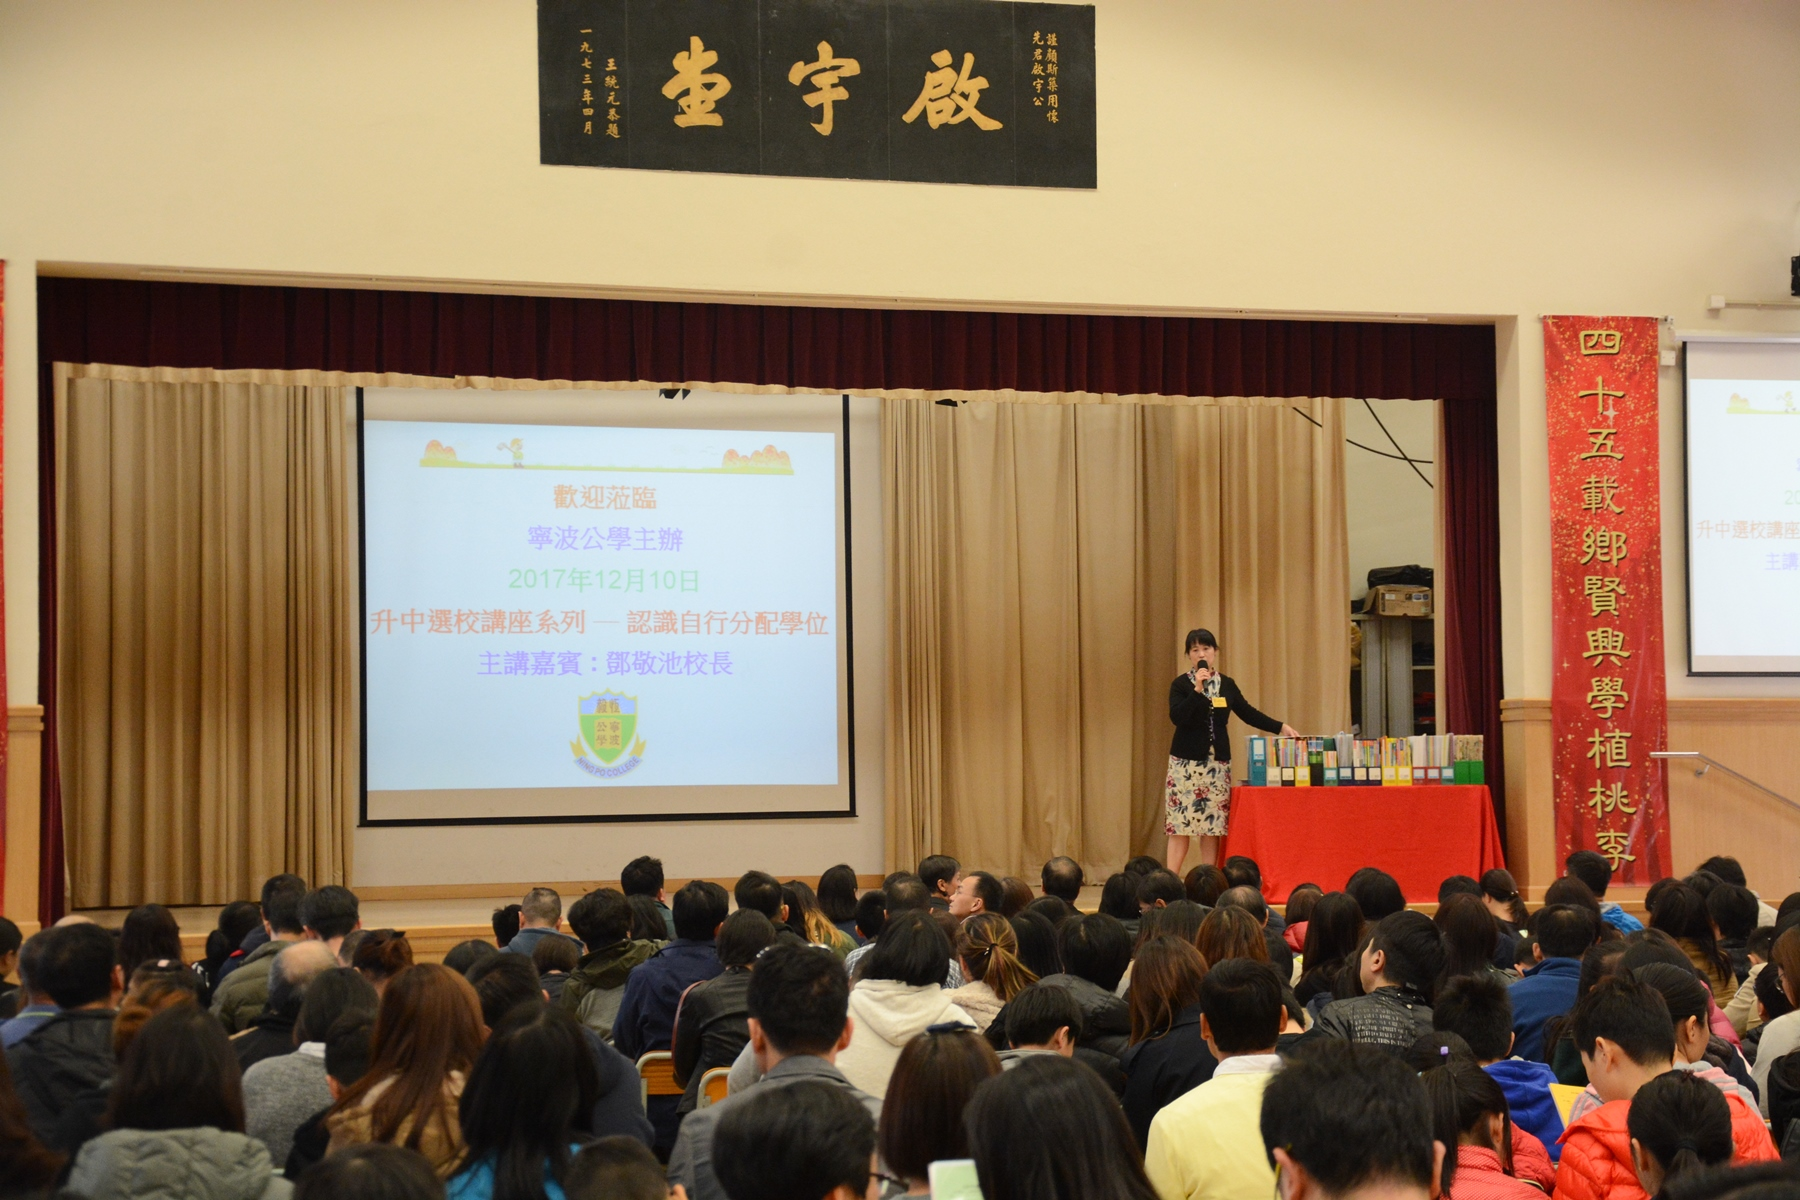 http://www.npc.edu.hk/sites/default/files/9_271.jpg